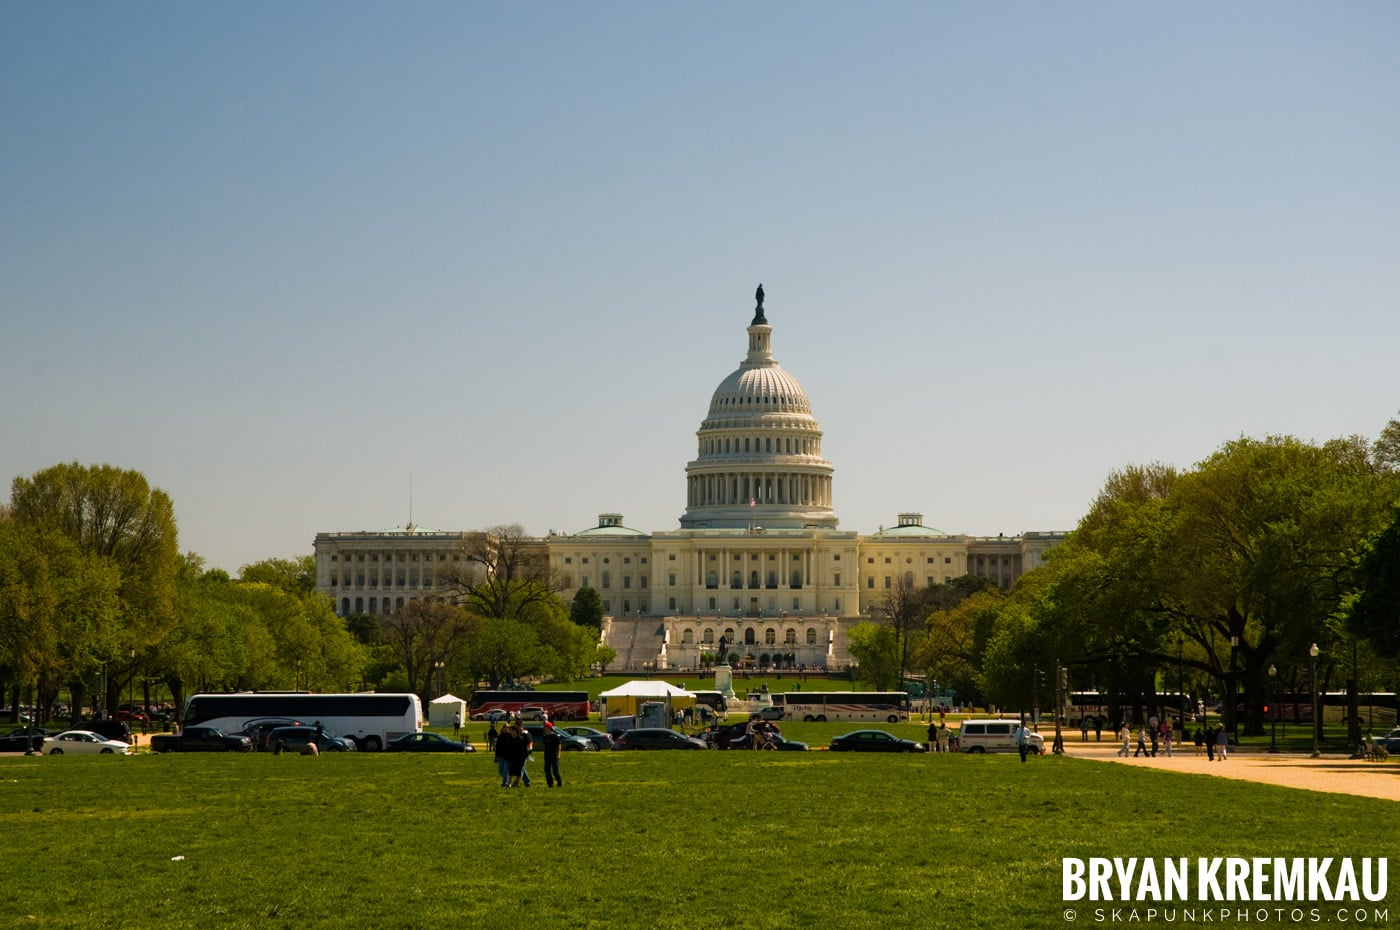 Washington, DC Trip - Day 3 - 4.10.10 (24)